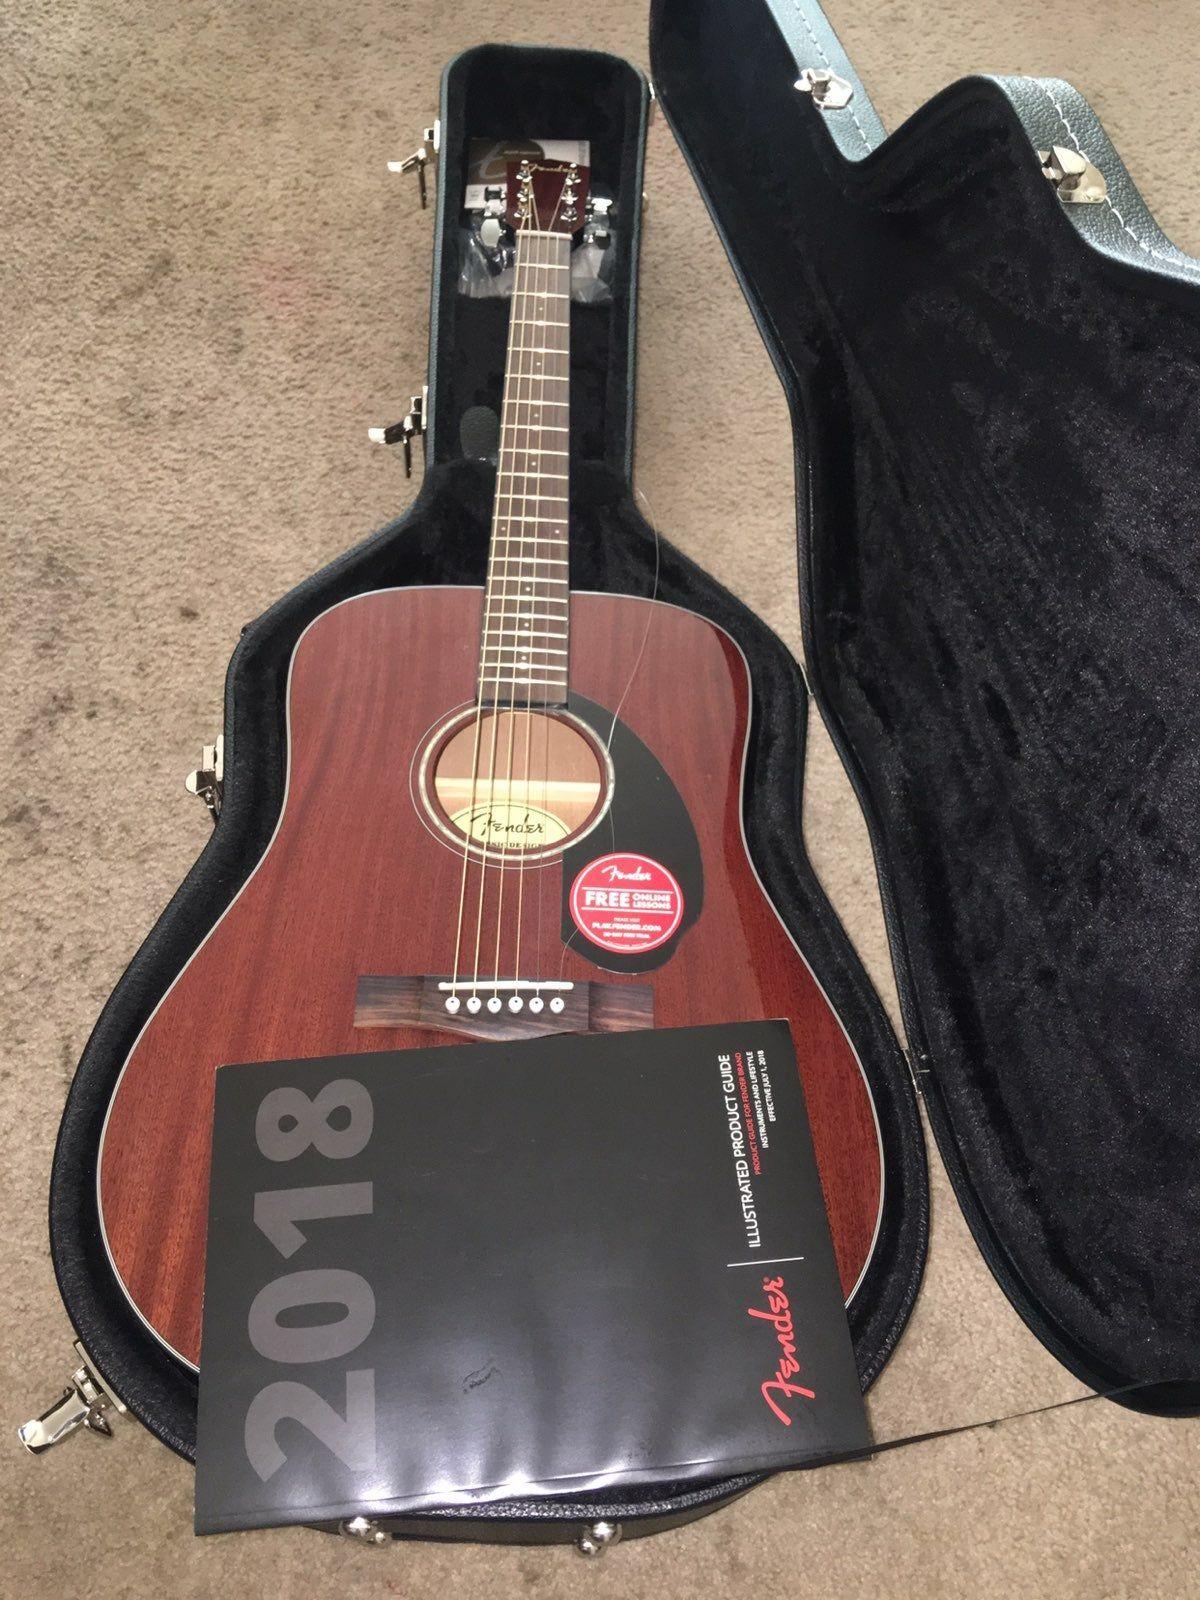 Brand New Acoustic Fender Guitar Guitar Acoustic Fender Guitars